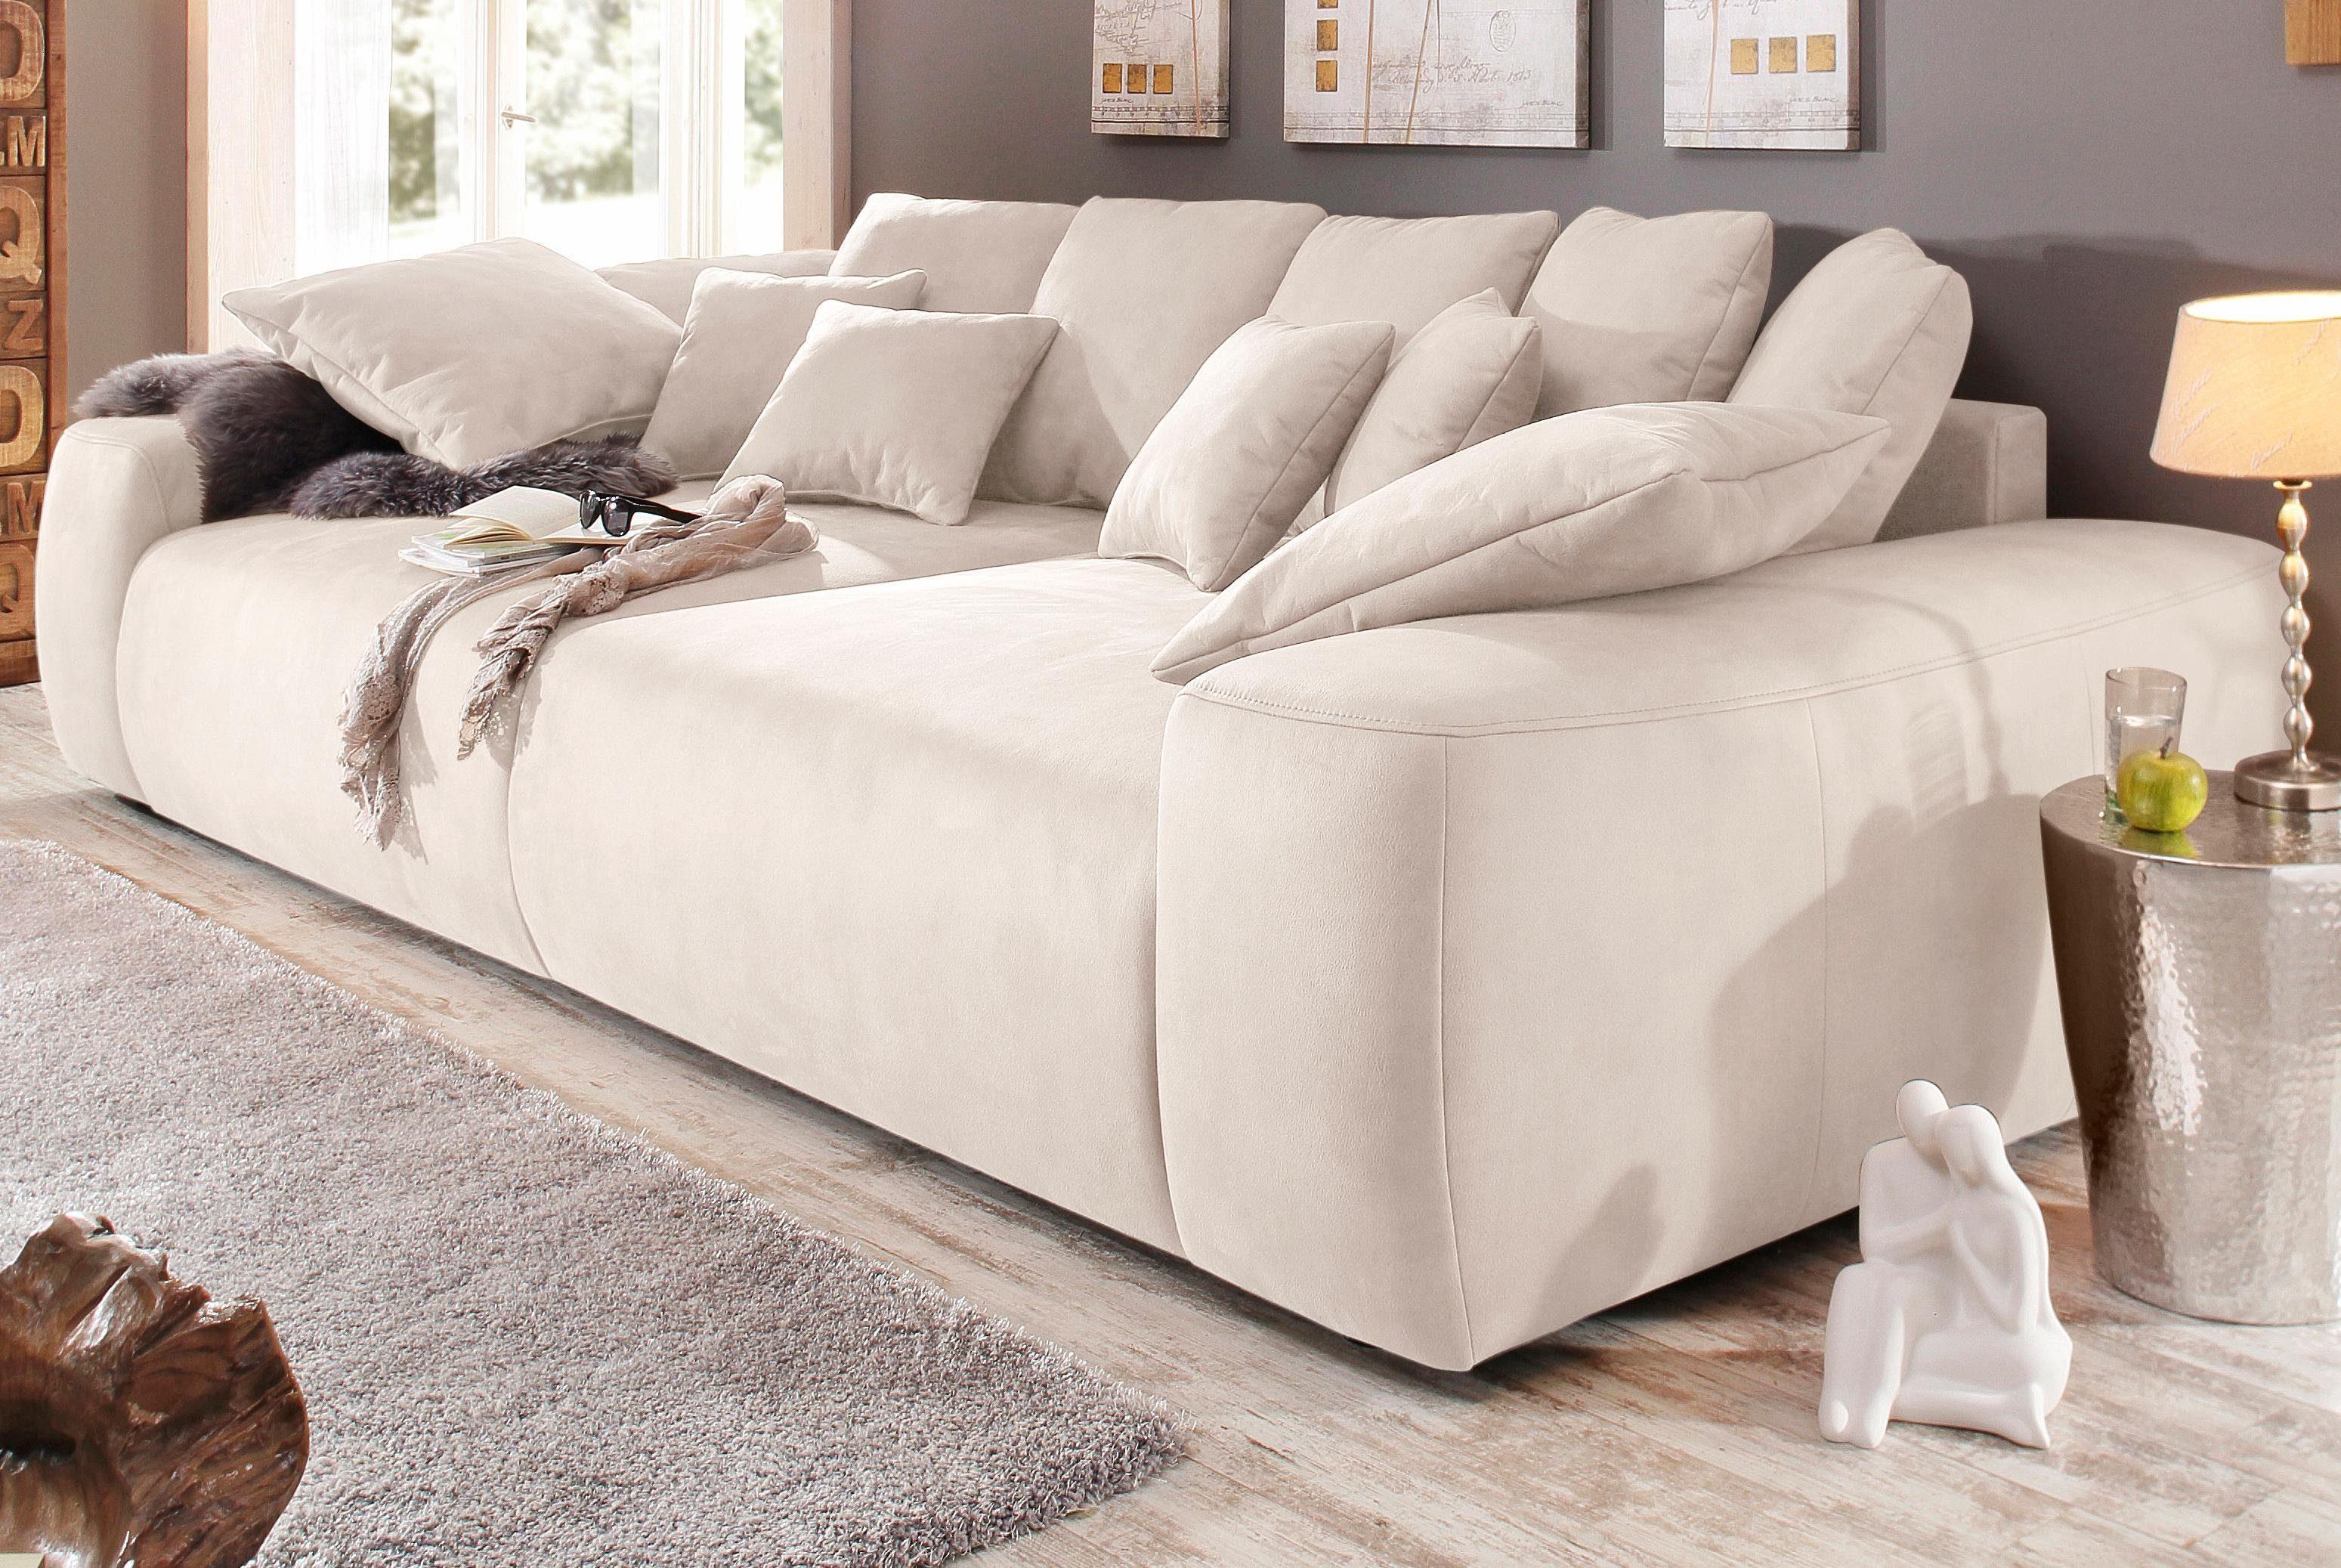 Big Sofa Federkern ~ Xxl sofa xxl couch online kaufen otto